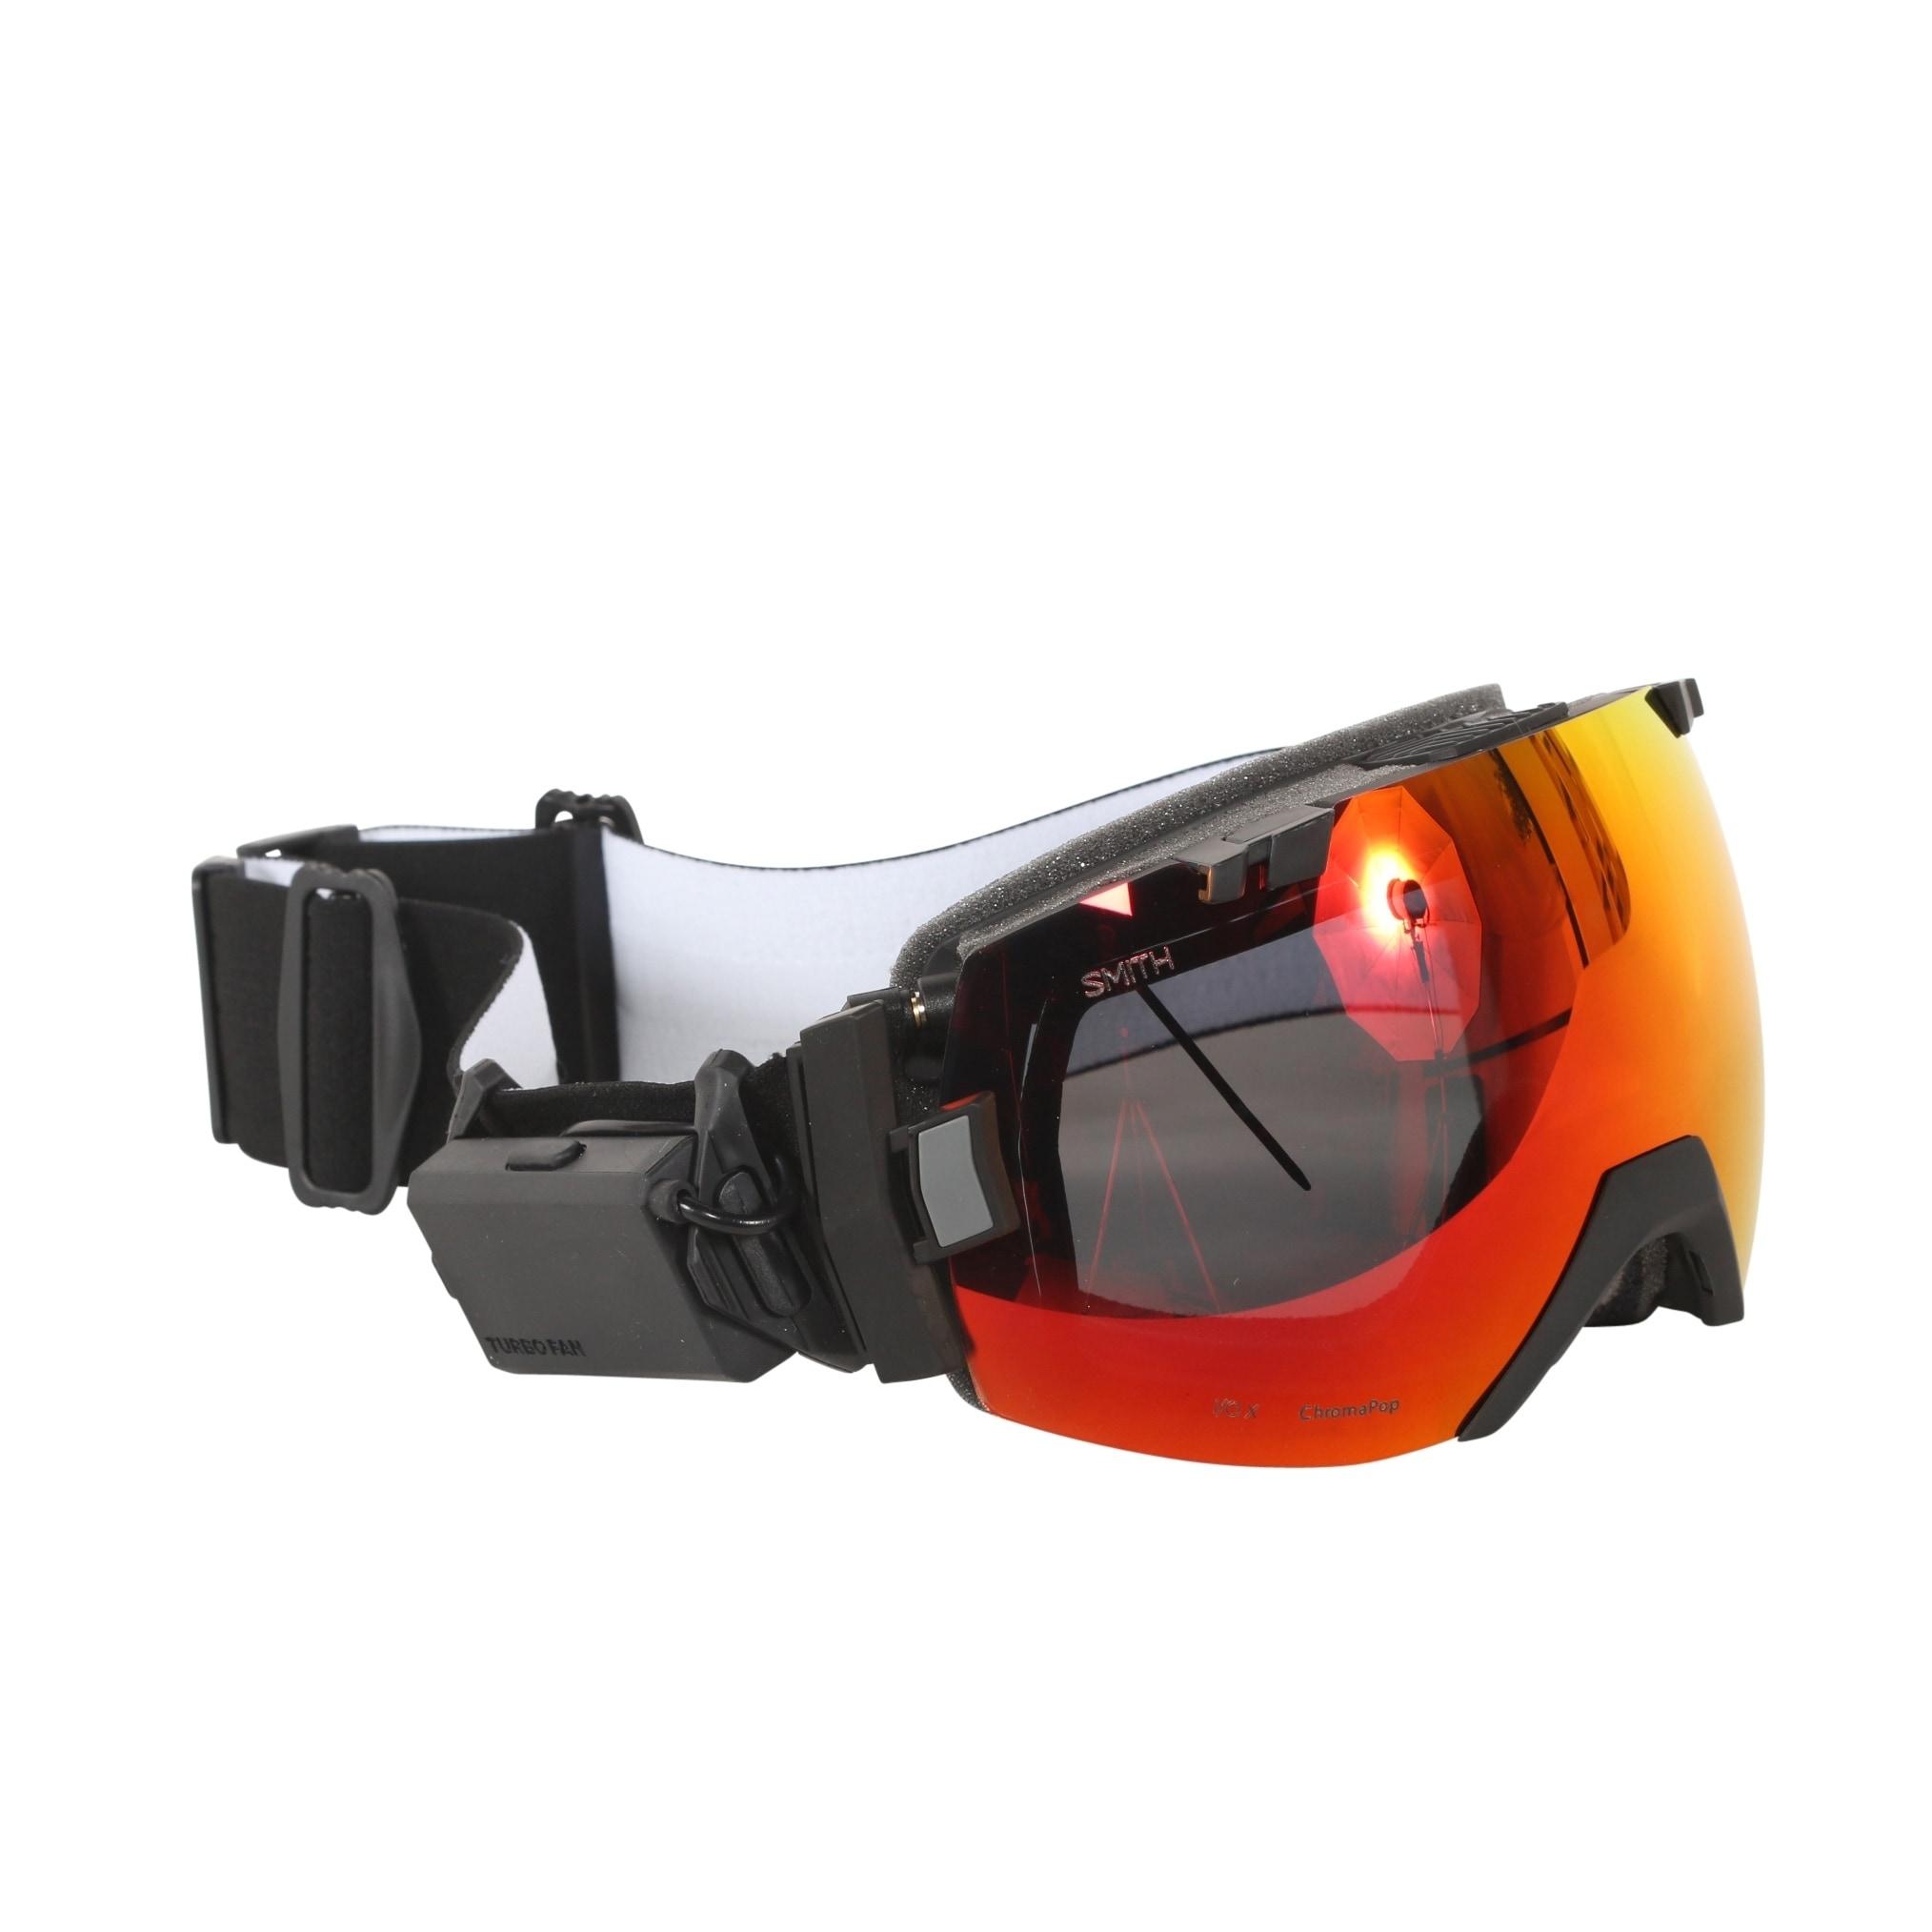 d460cf46592a4 Shop Smith Optics Black ChromaPop Sun I OX Turbo Fan Interchangeable Goggles  - Ships To Canada - Overstock - 18222478